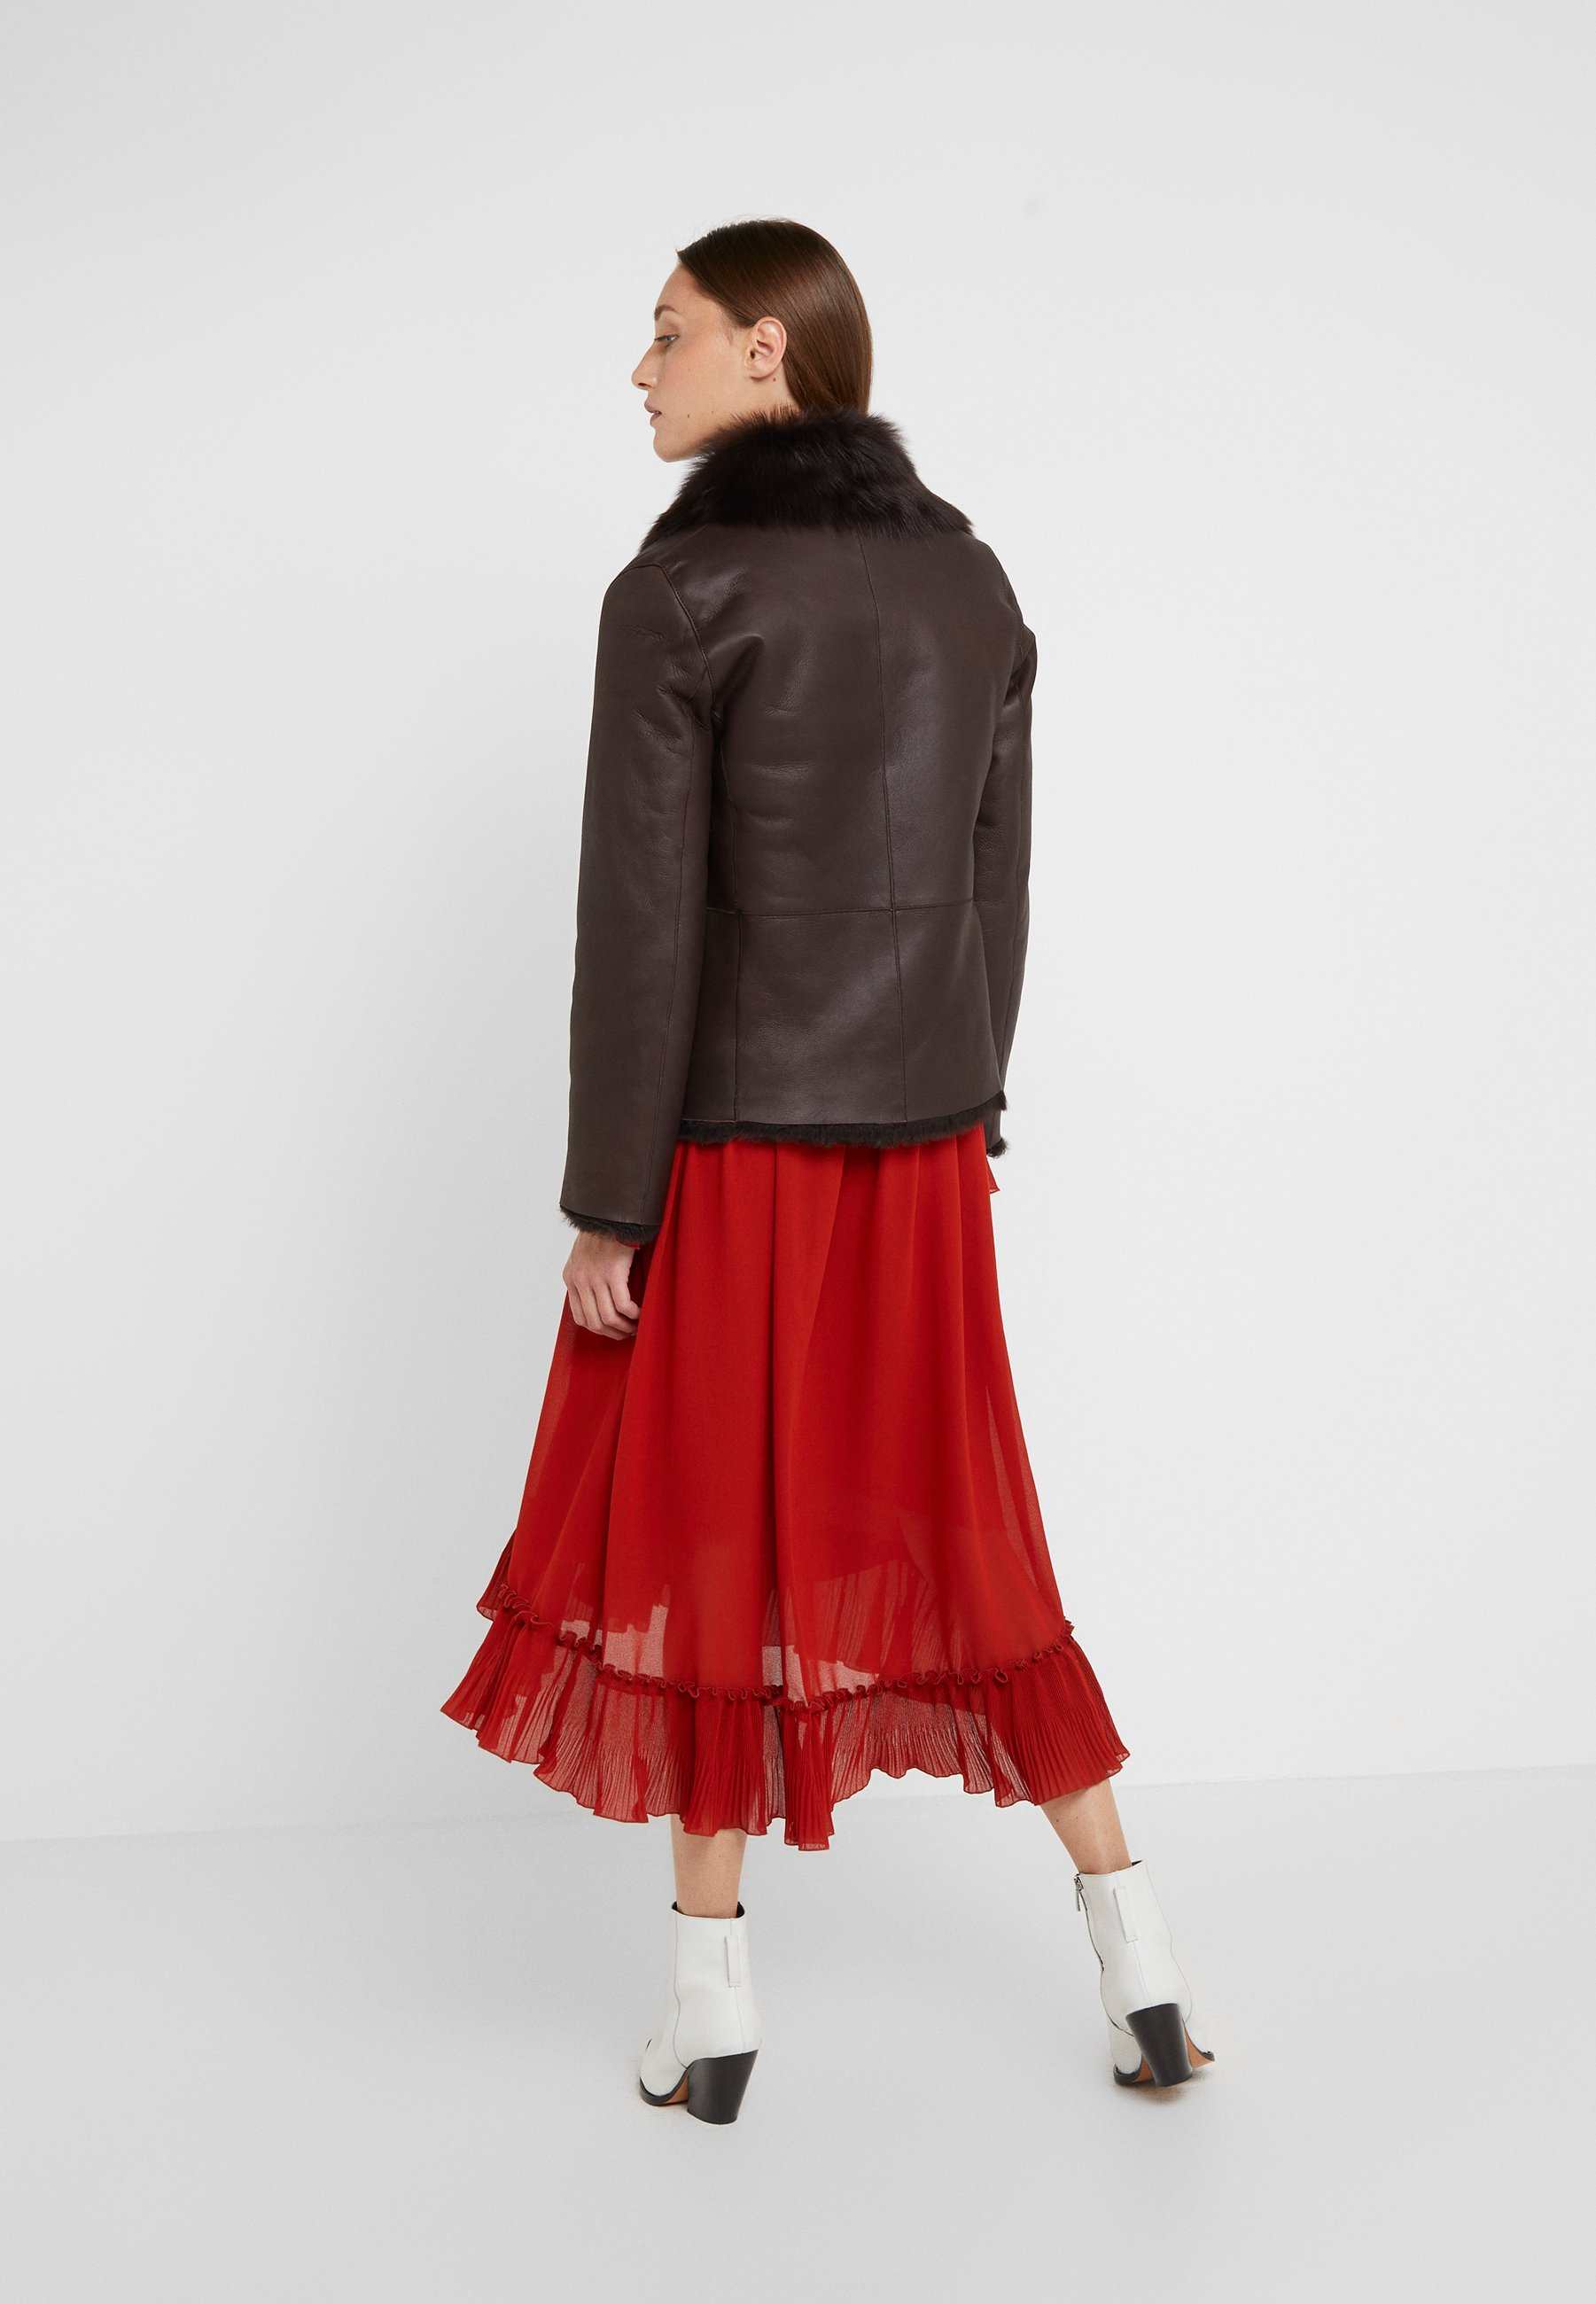 Fashion Style Women's Clothing STUDIO ID PHILIPPA JACKET Leather jacket brown 20A0x2W9N